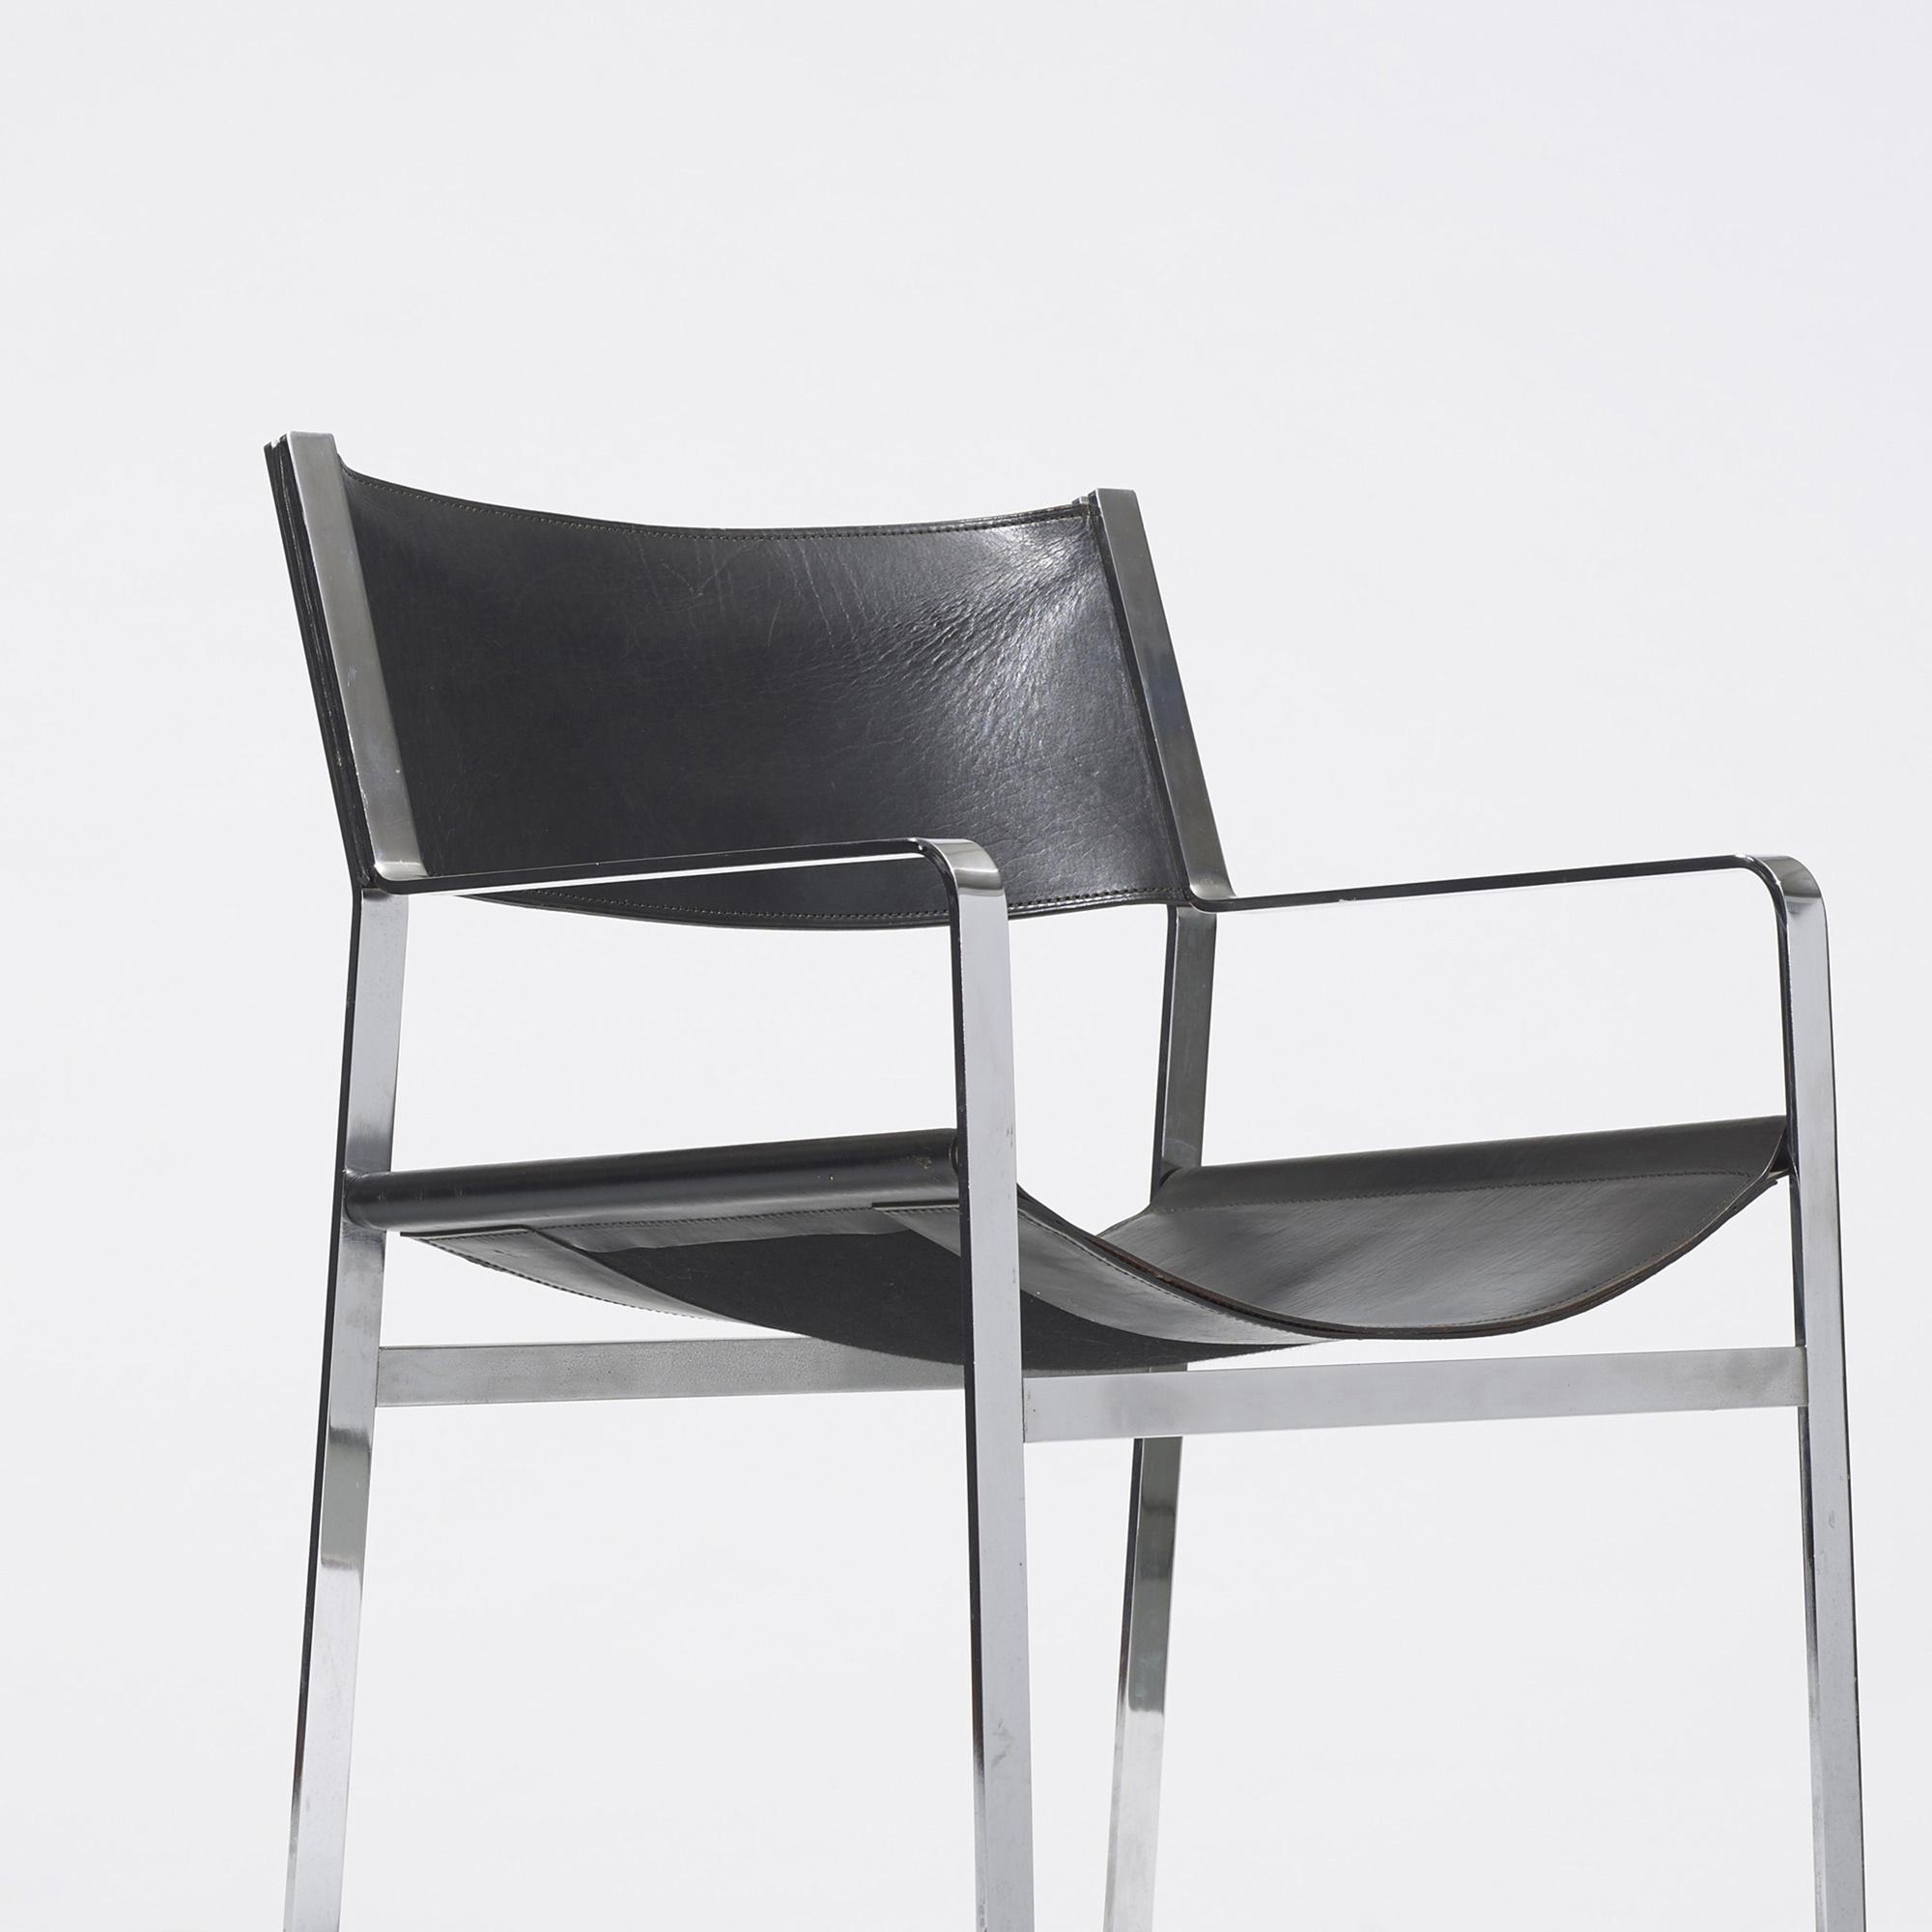 687: HANS J. WEGNER, armchair, model JH812